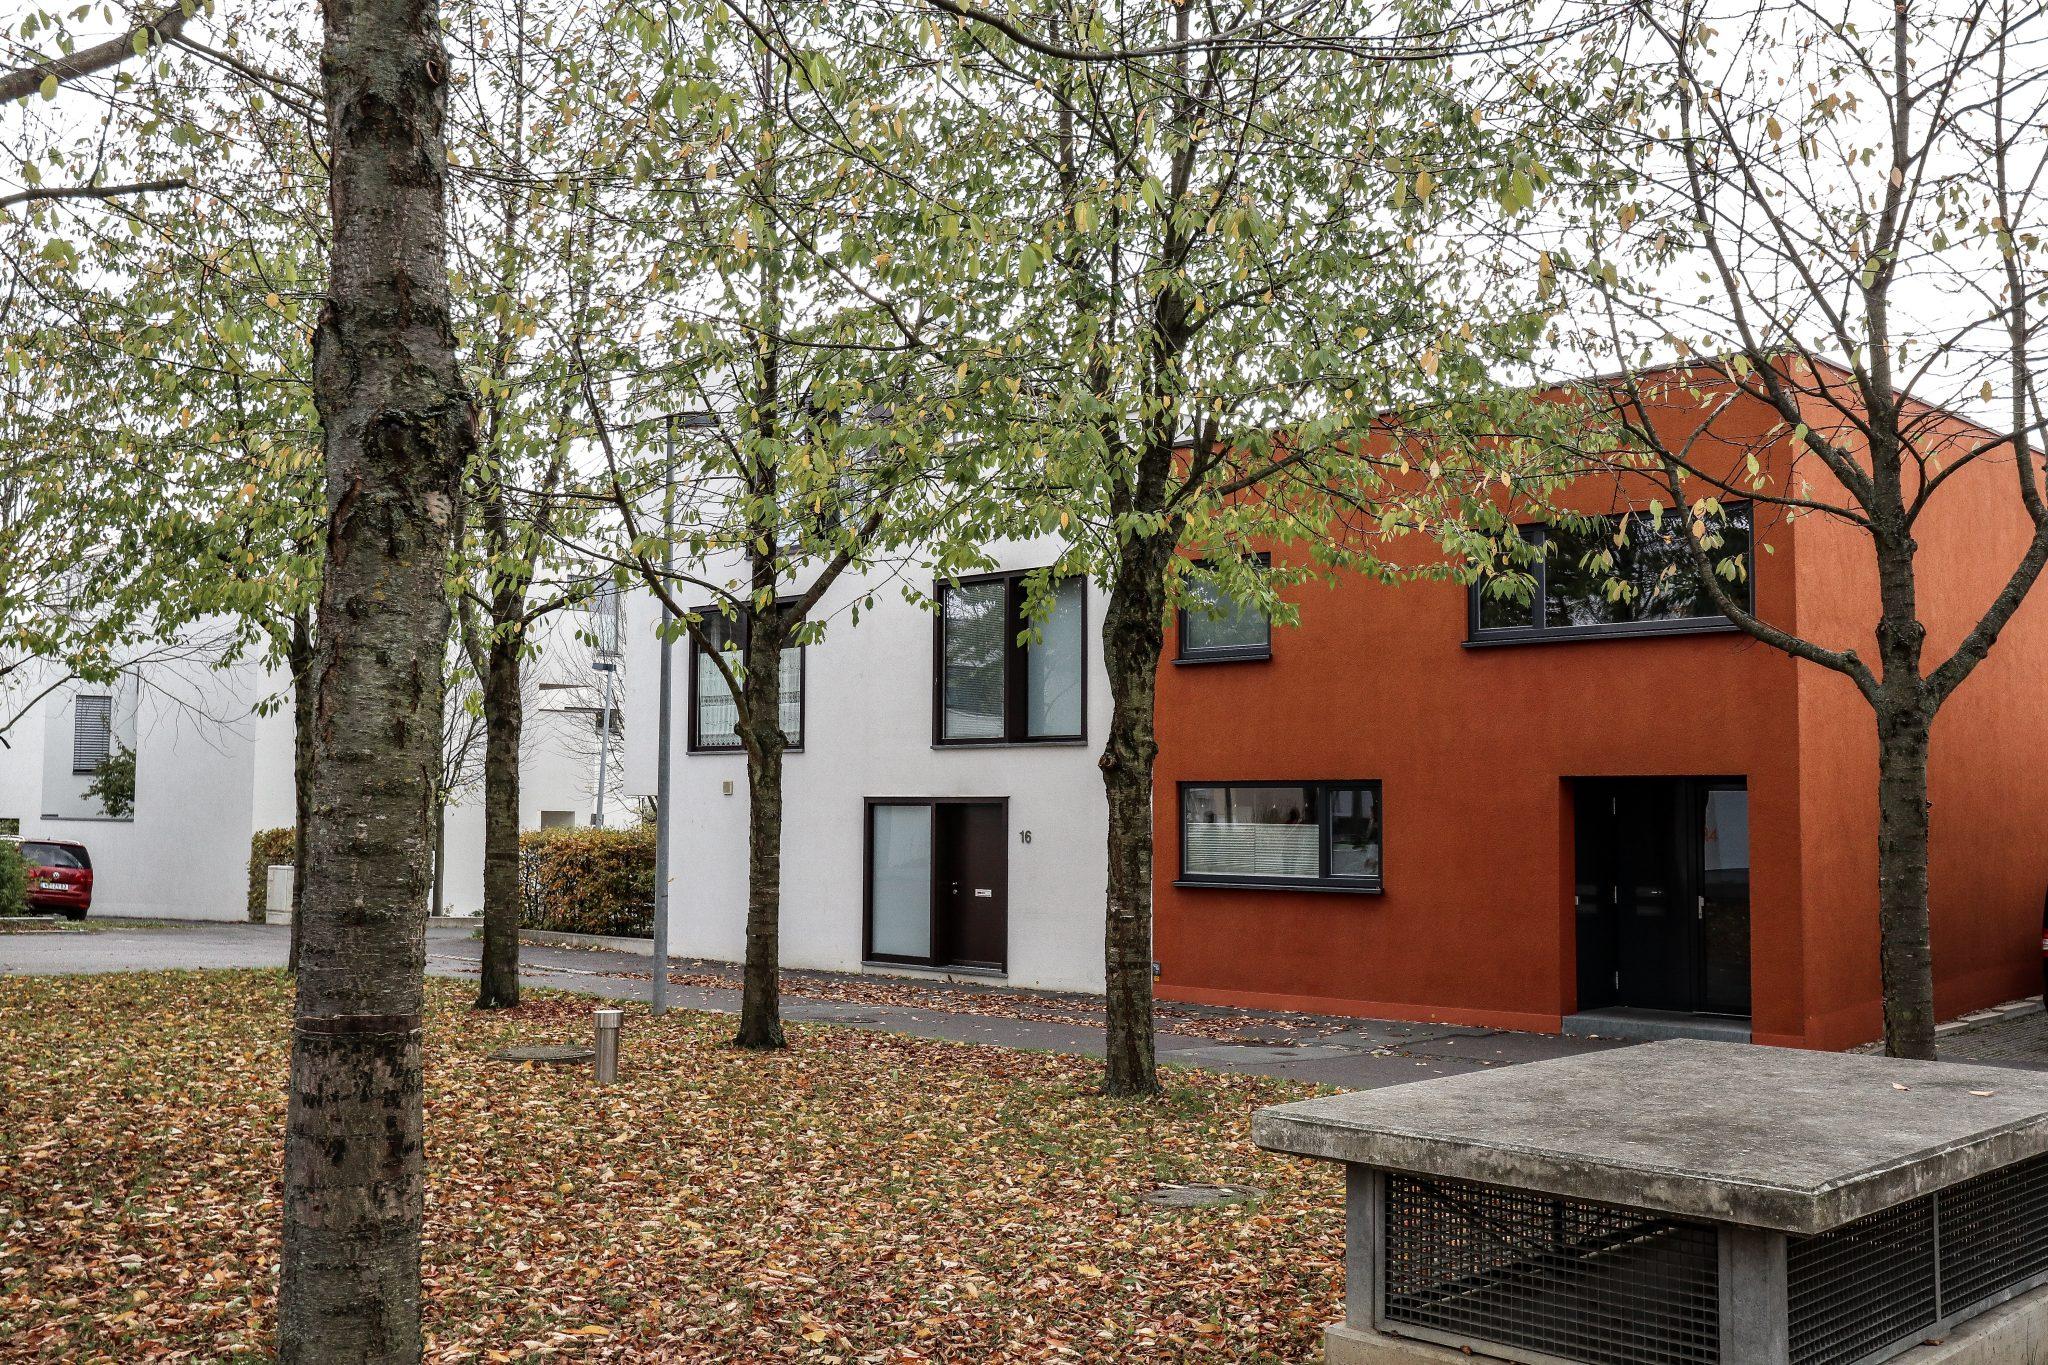 Neues Bauen in Weimar, Germany